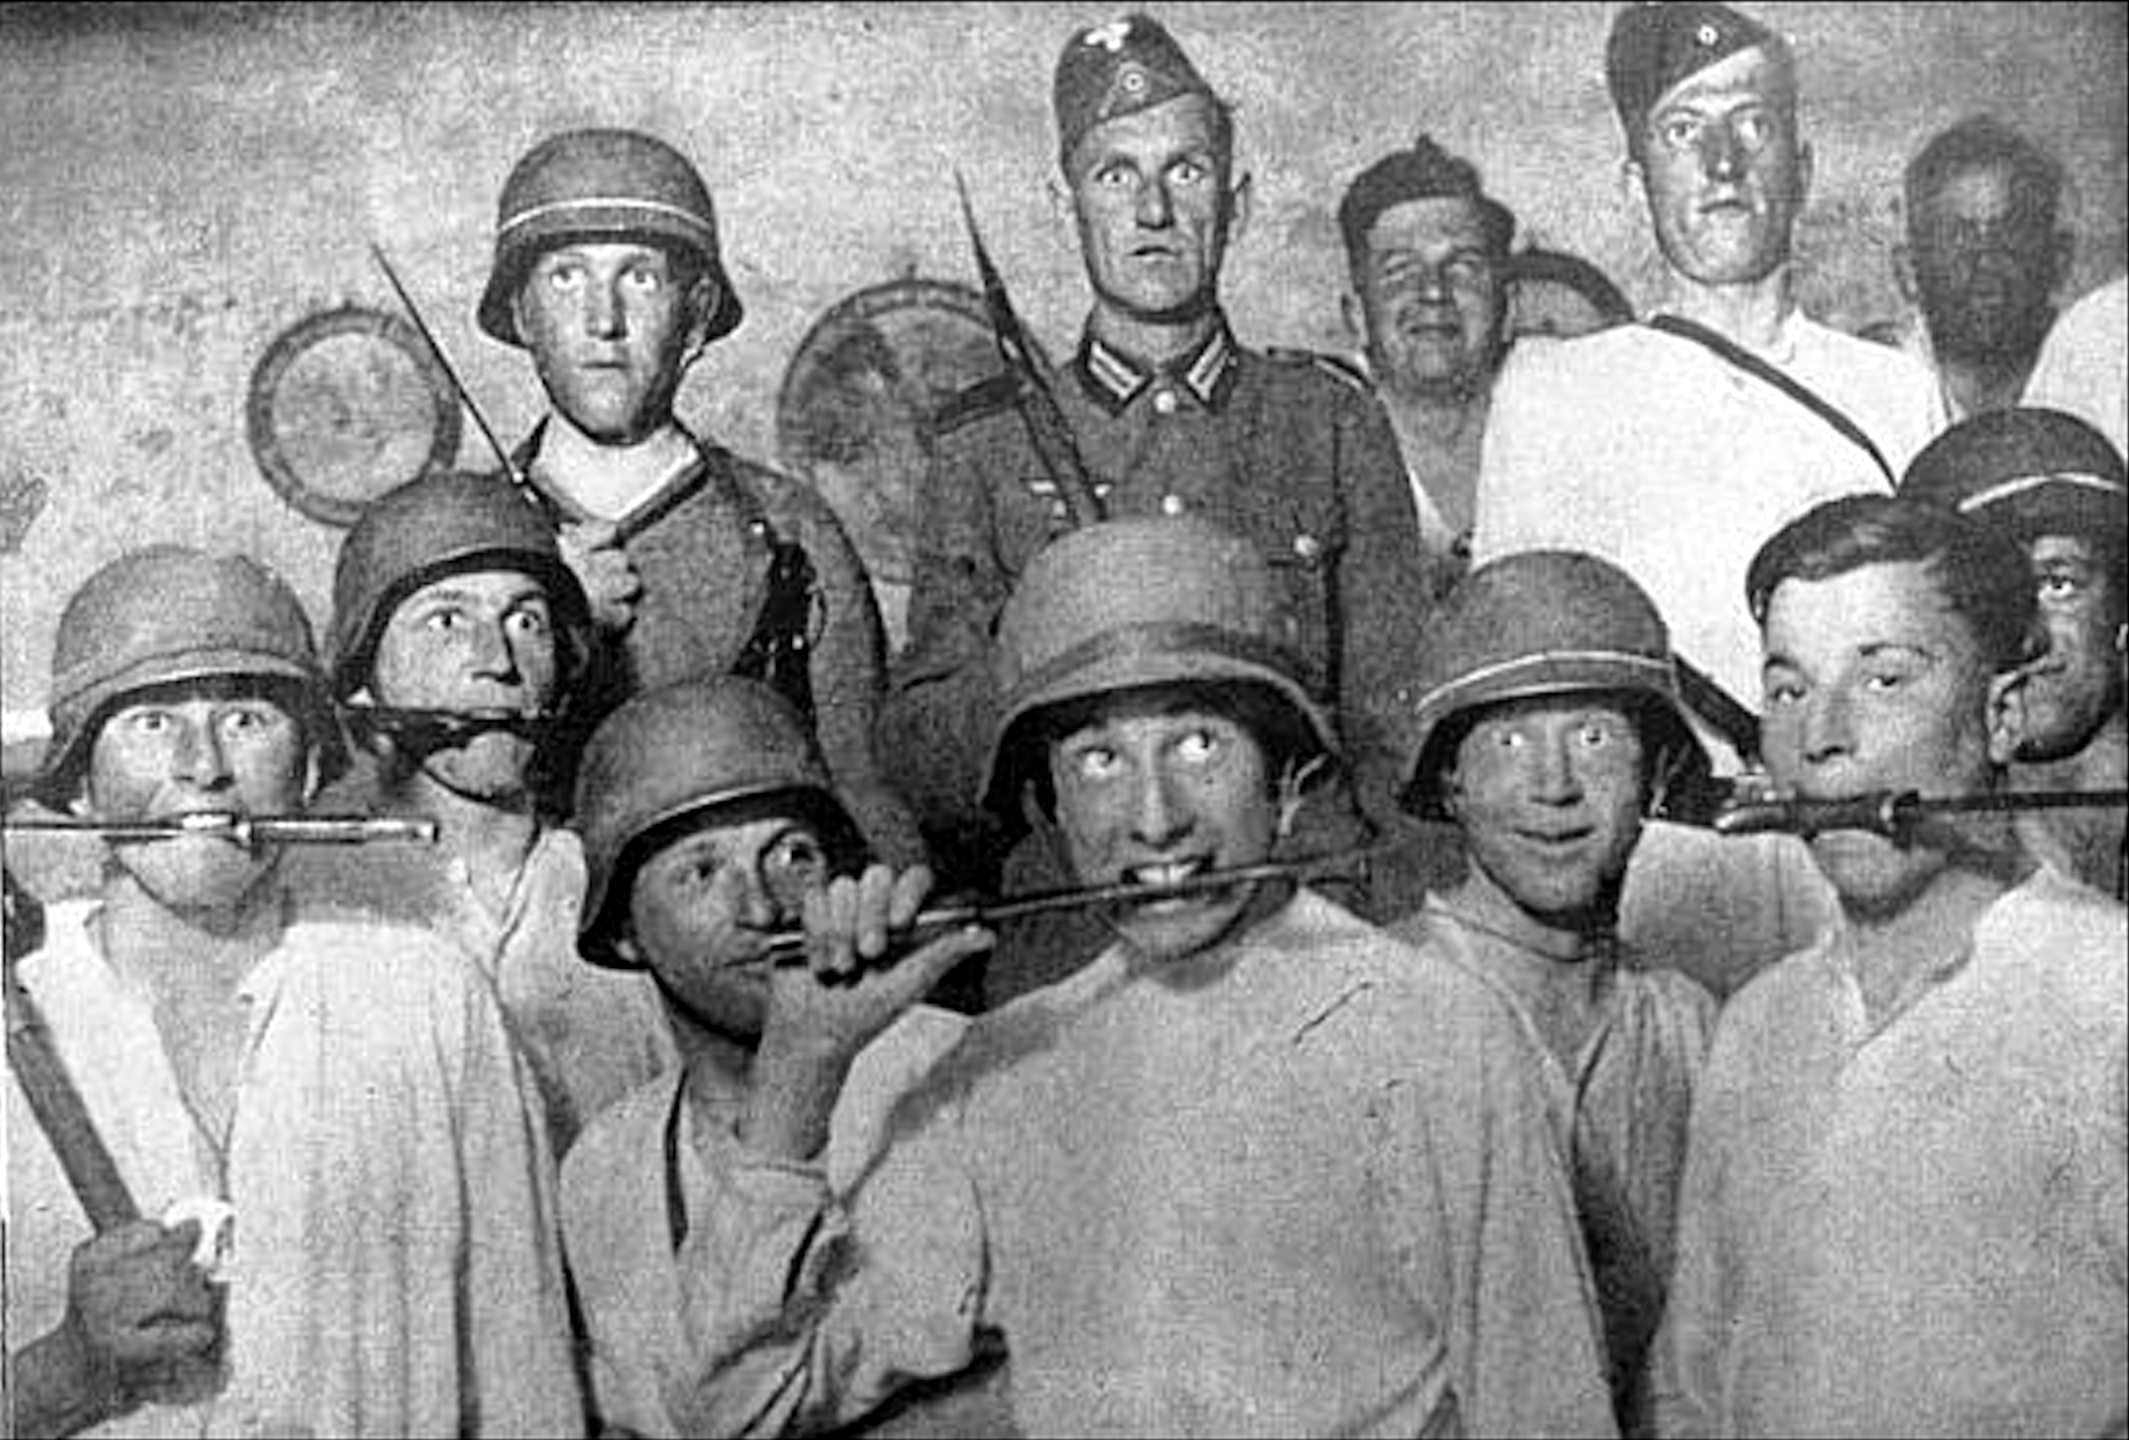 вермахт армия наркоманов1.png